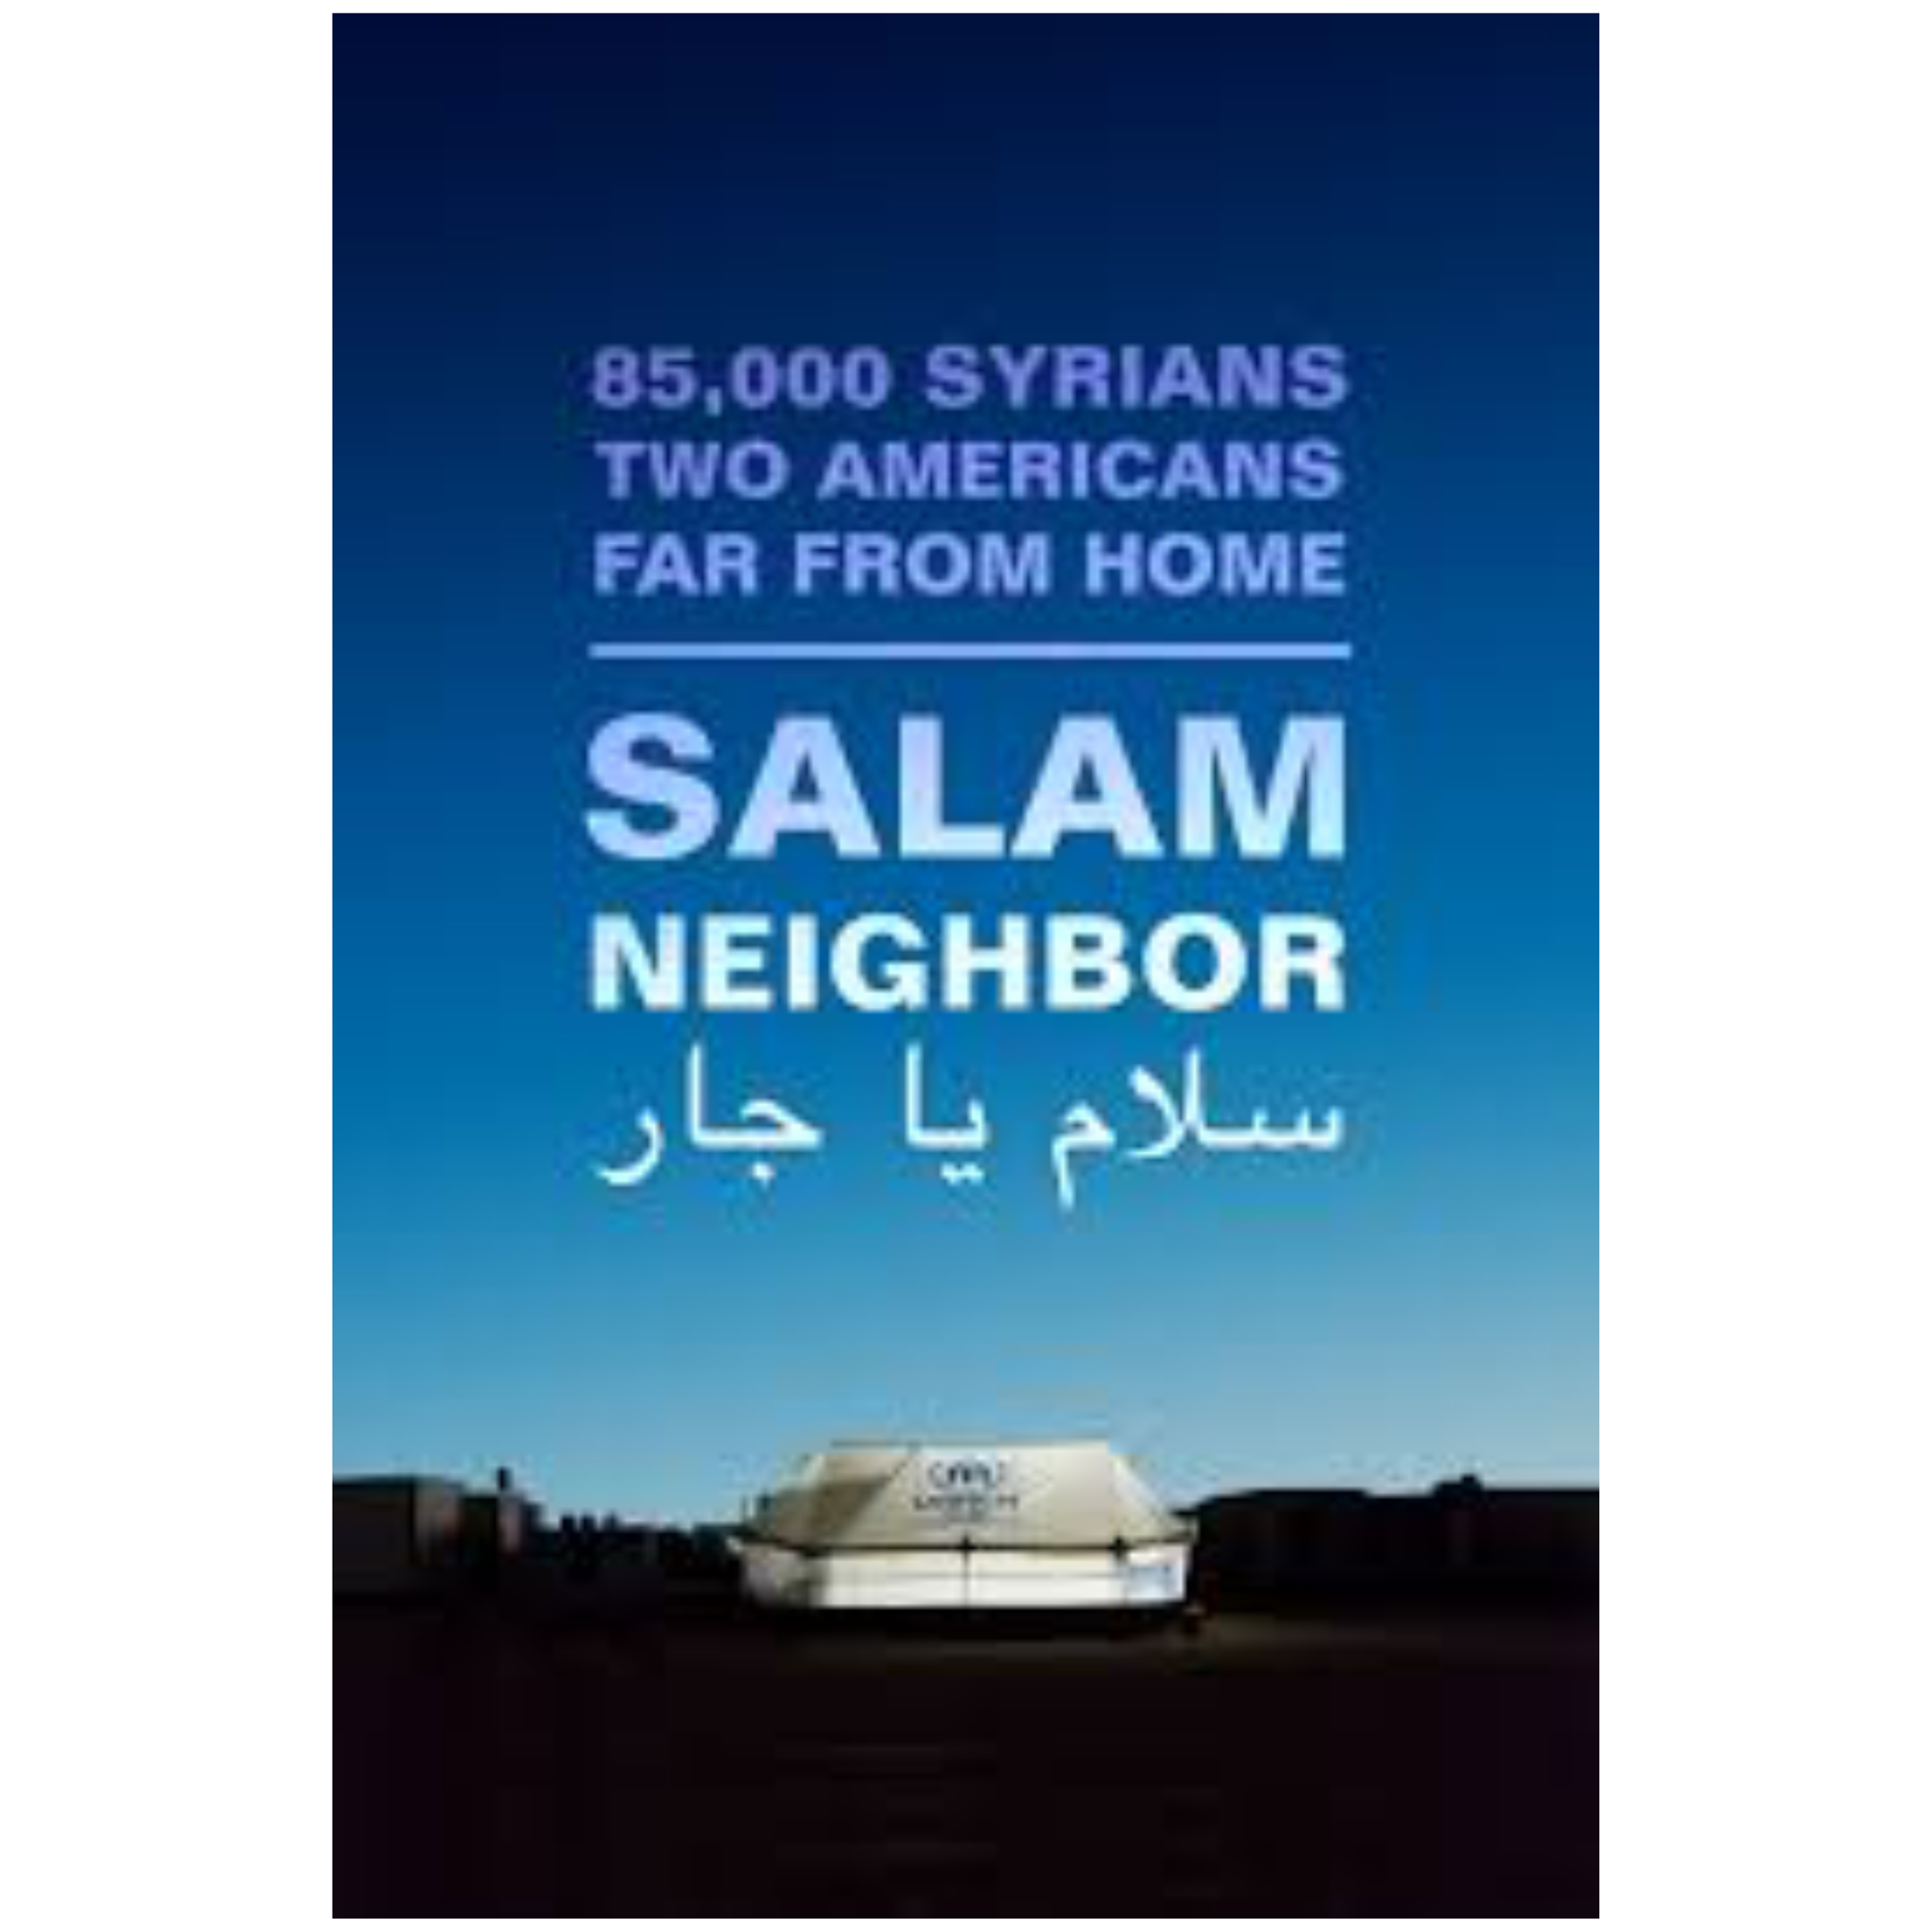 Salam Neighbor Documentary   Cedar + Surf Must-Watch List